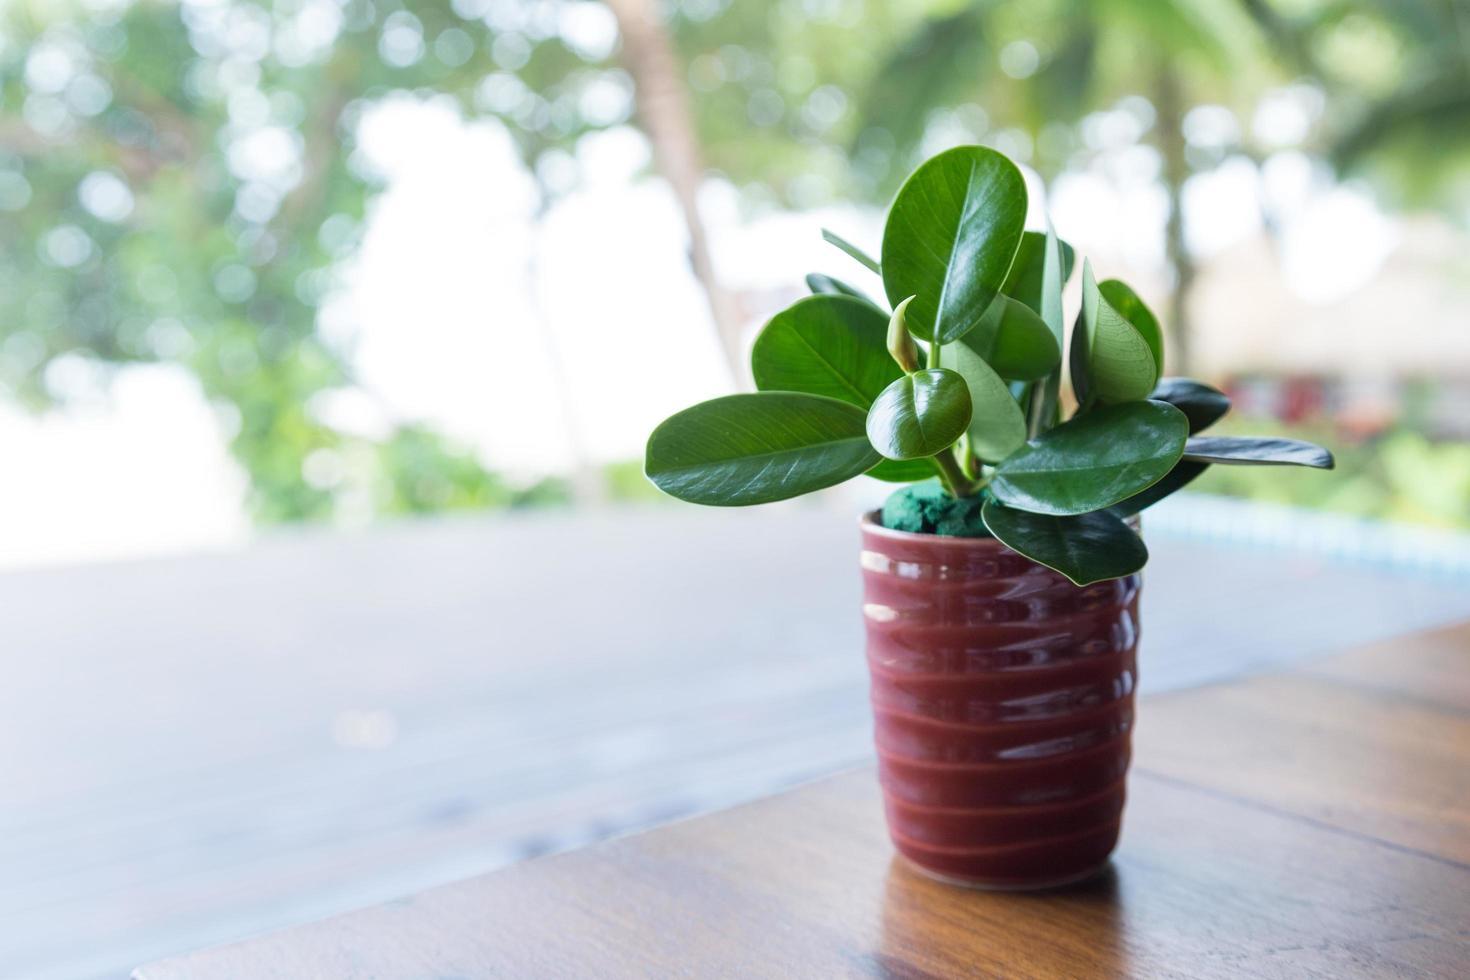 plante sur la table photo